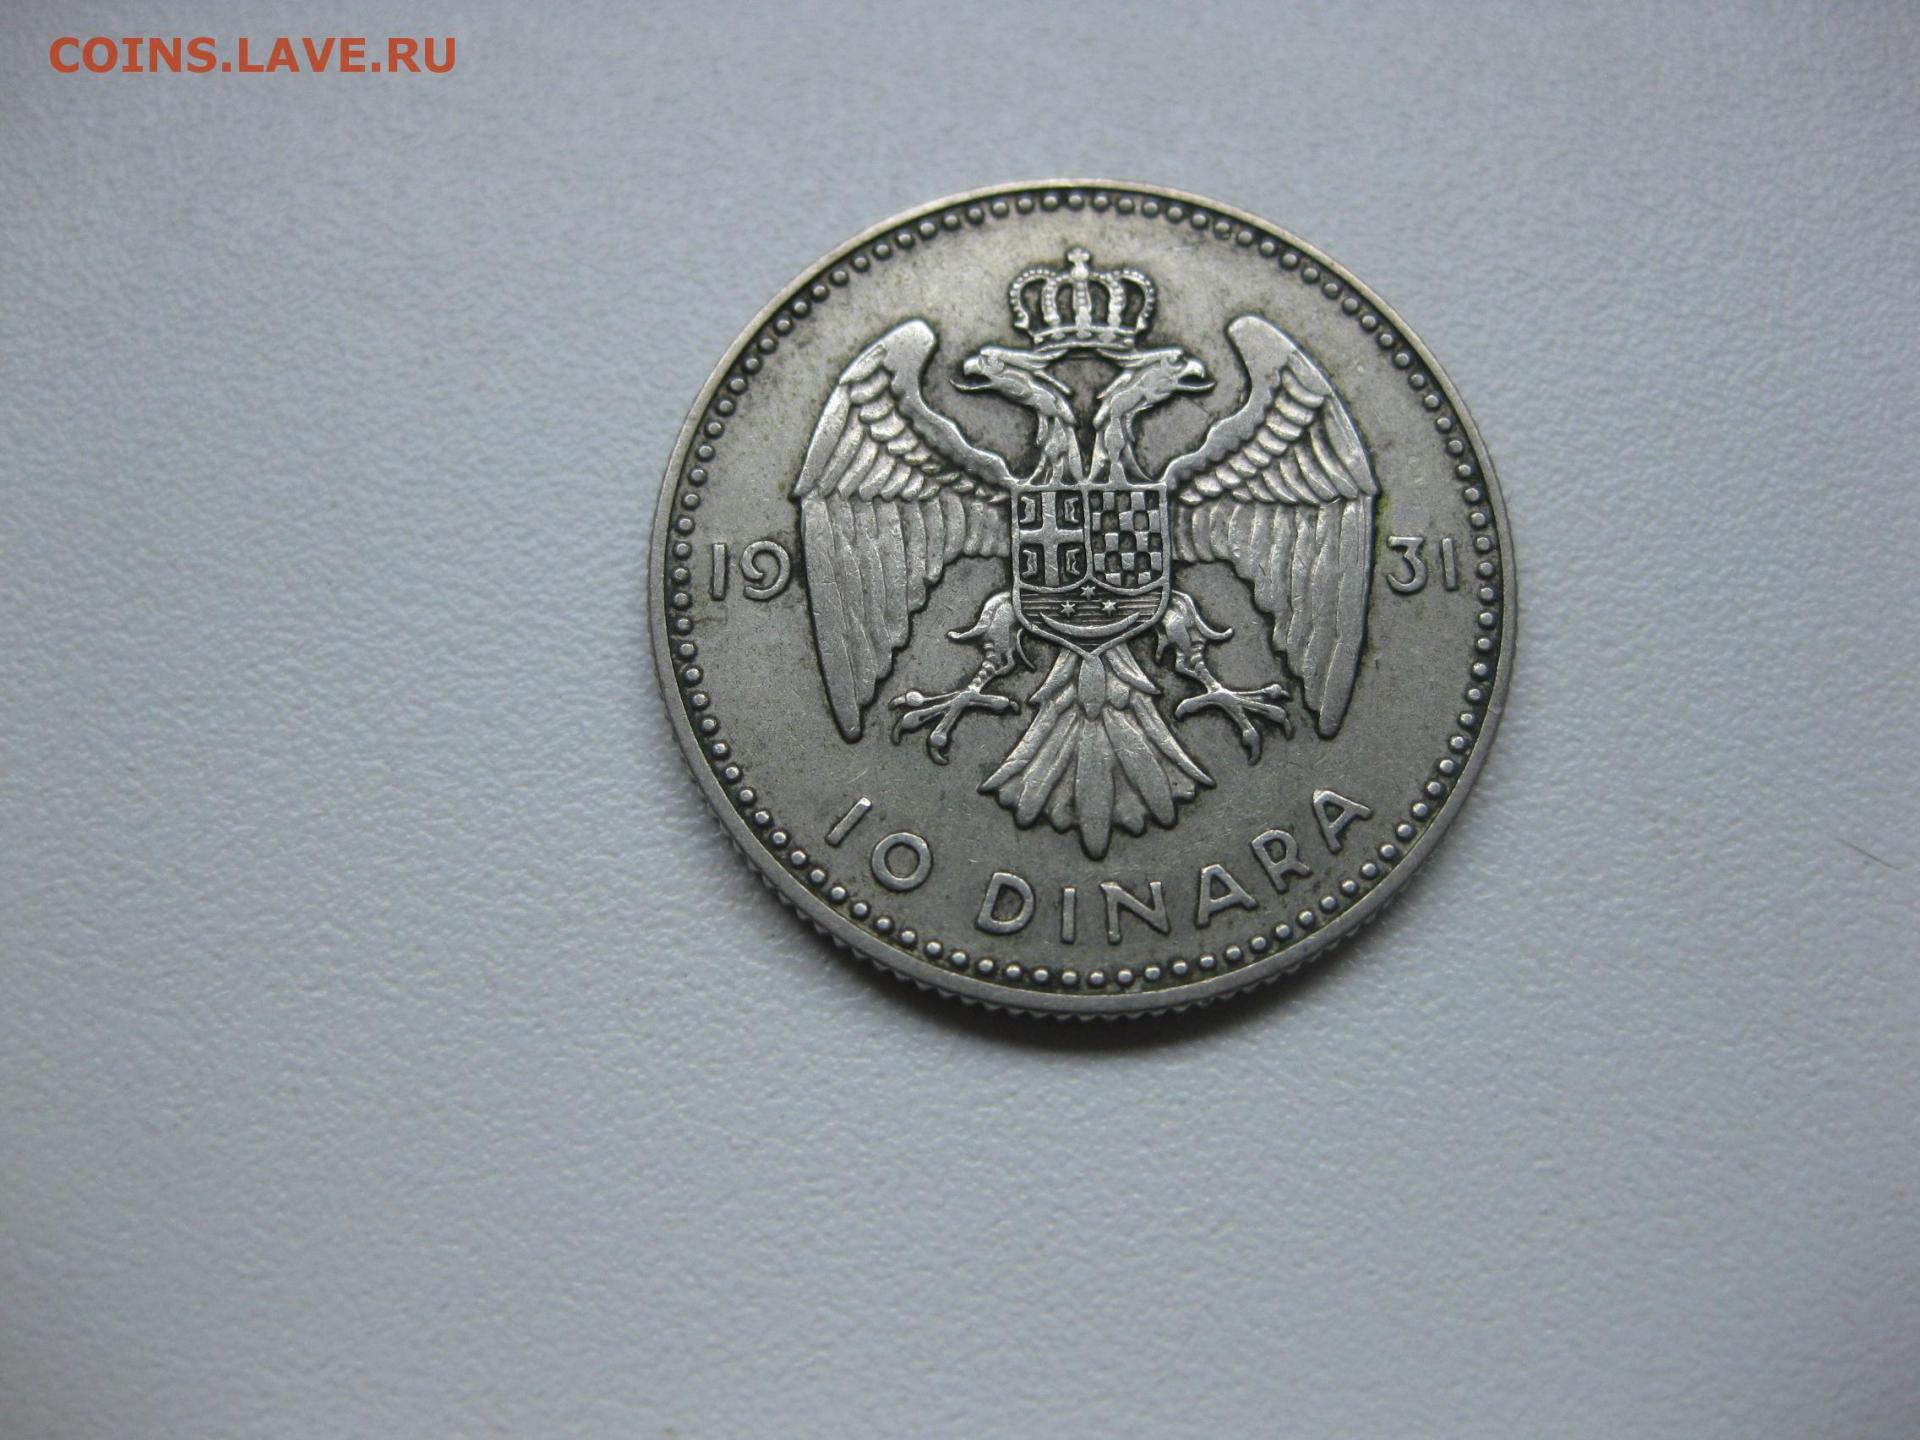 Аукцион lave 10 копеек 2008 года цена